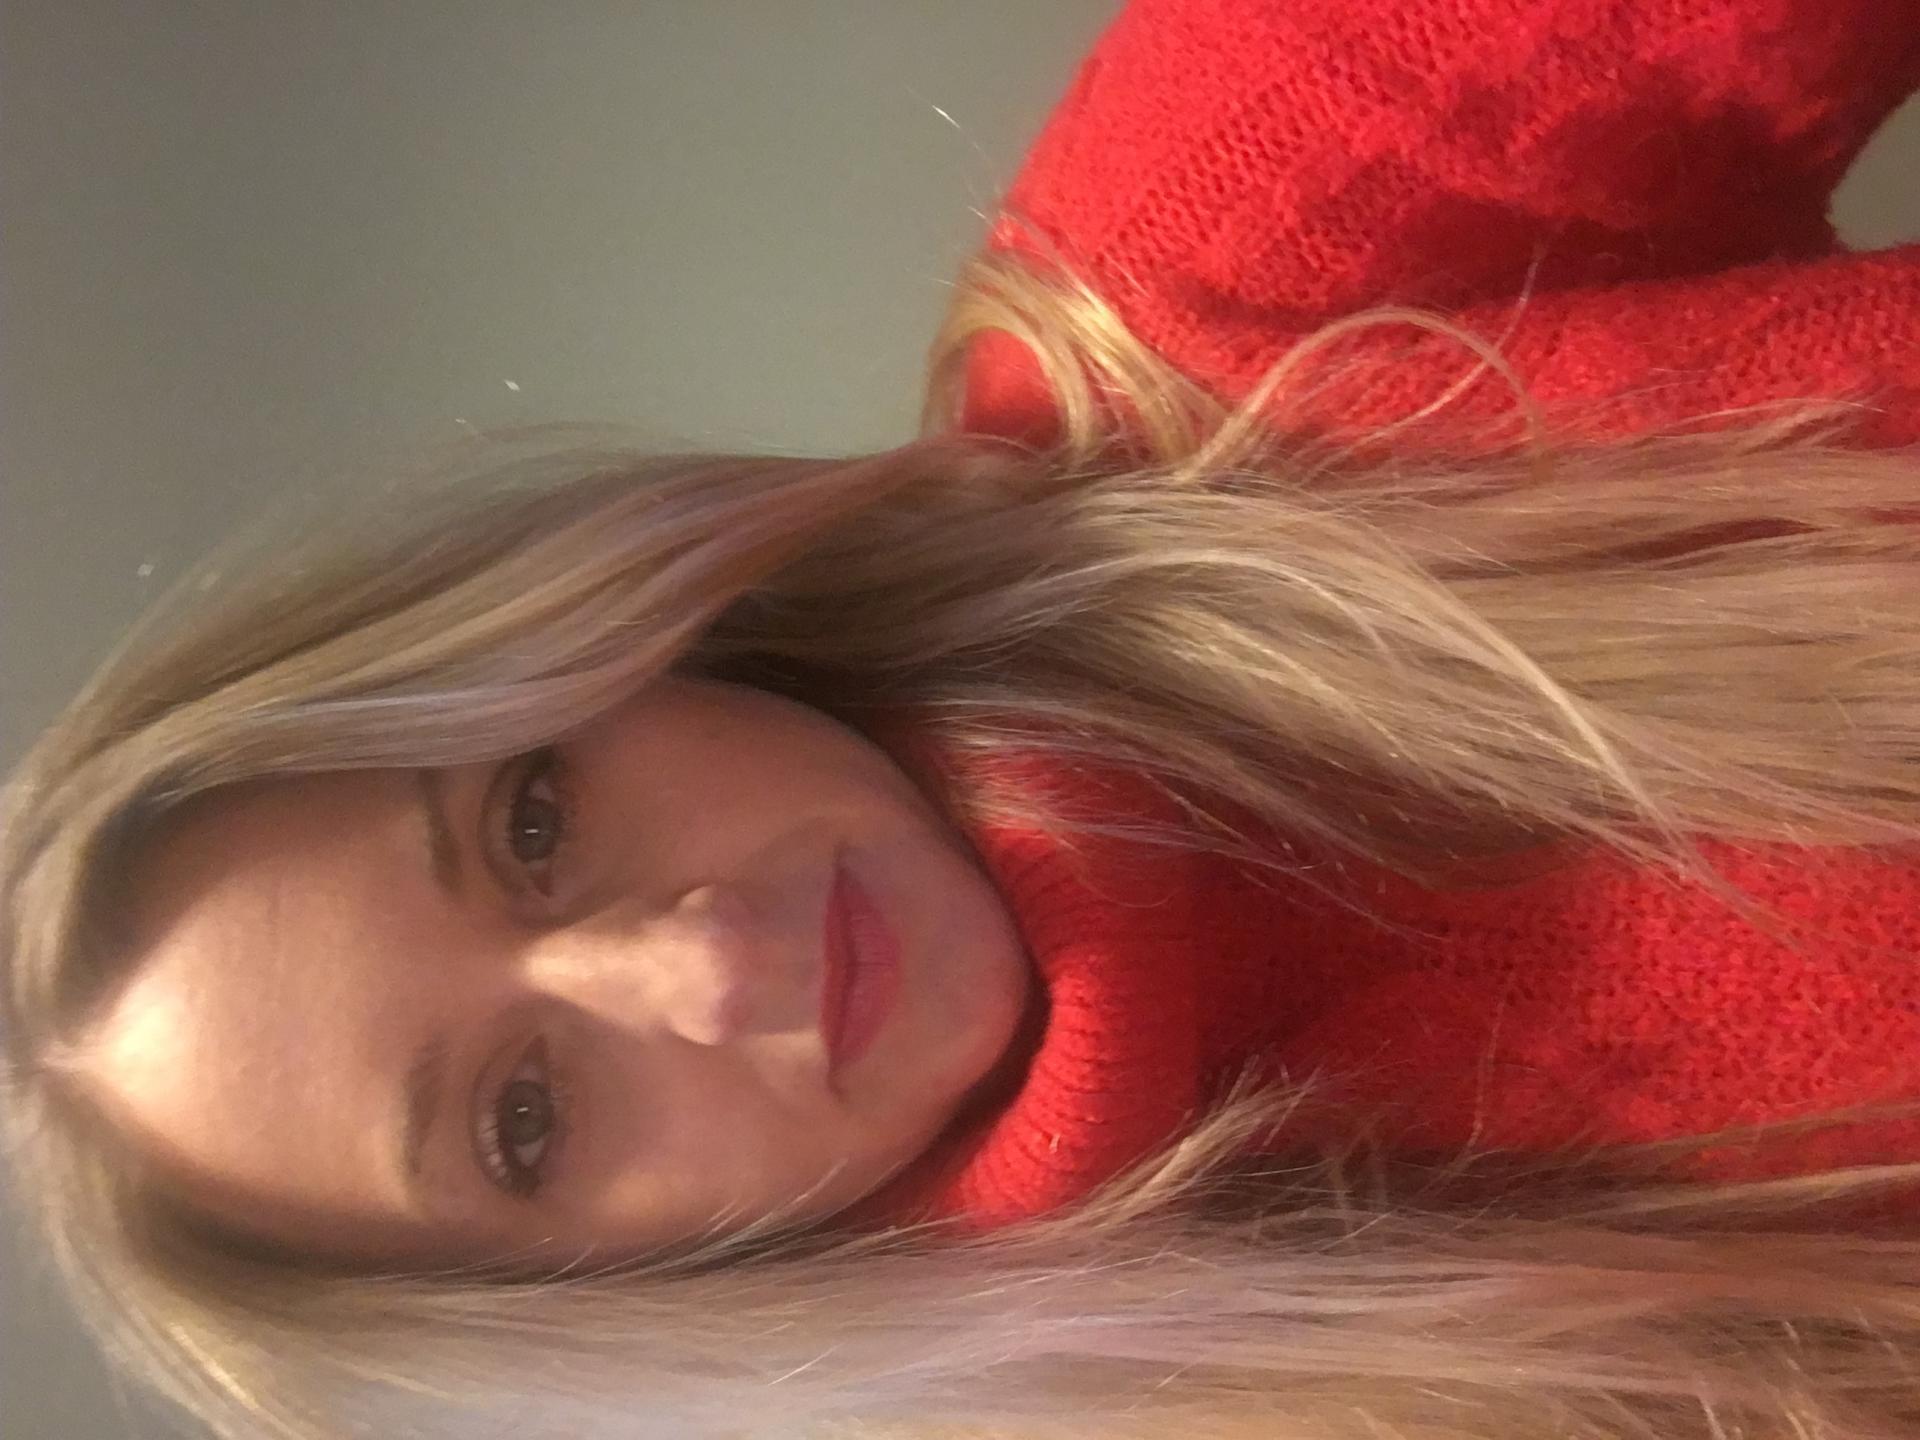 festive eyes with charlotte tilbury